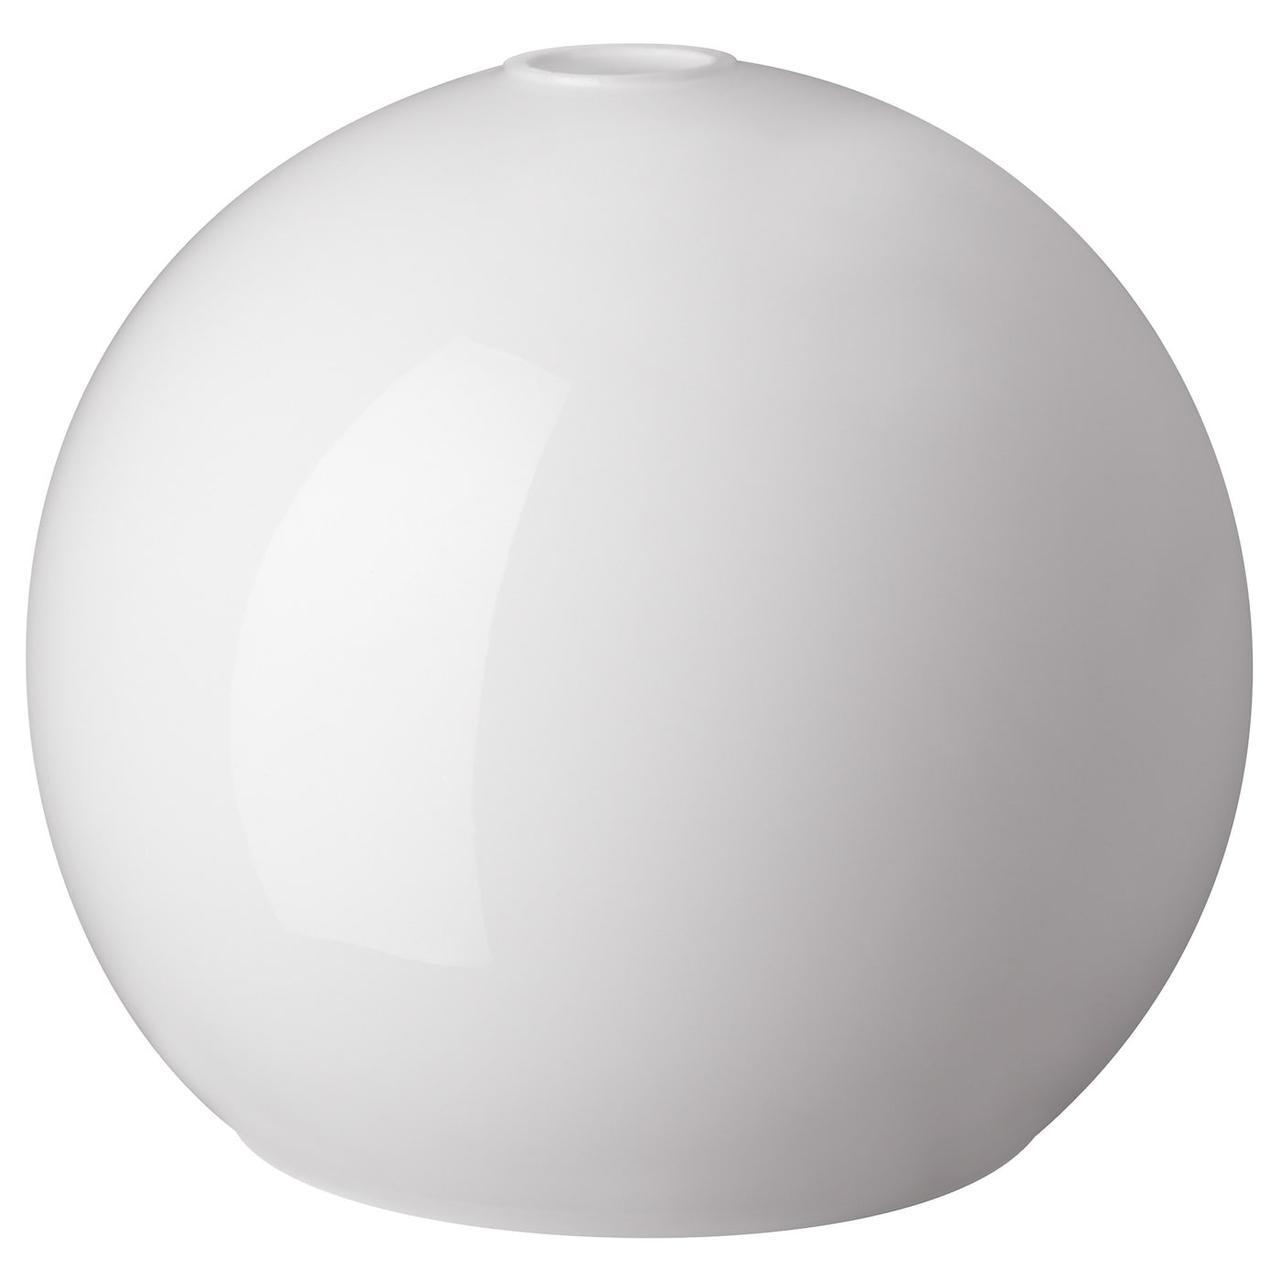 IKEA JAKOBSBYN  Абажур для подвесного светильника, белый (703.330.48)